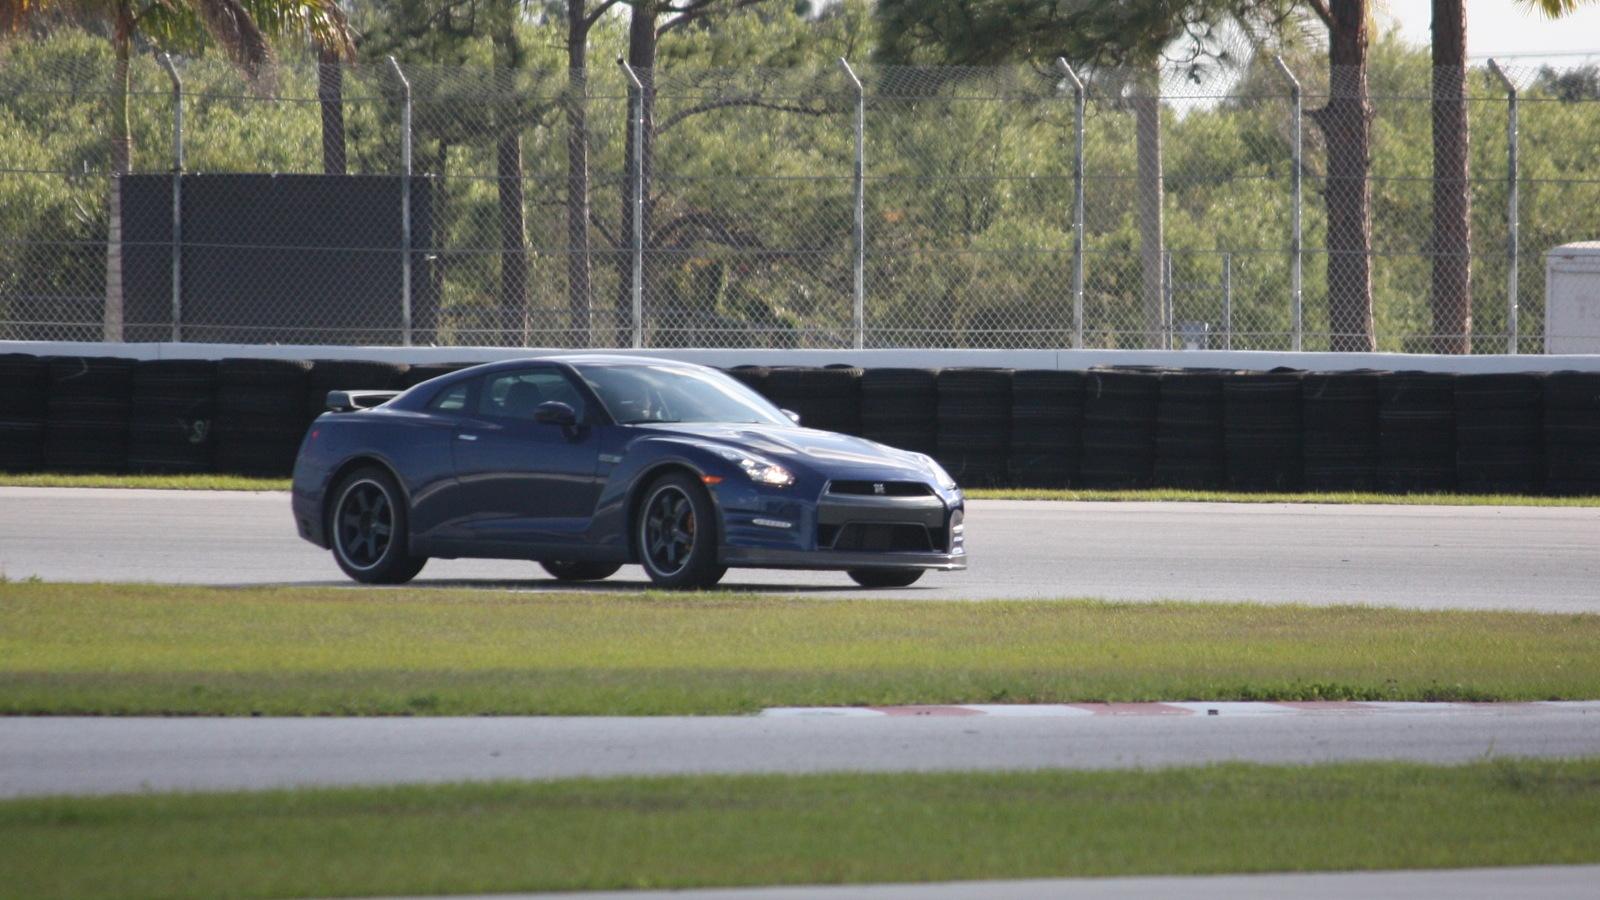 The 2013 Nissan GT-R at Palm Beach International Raceway